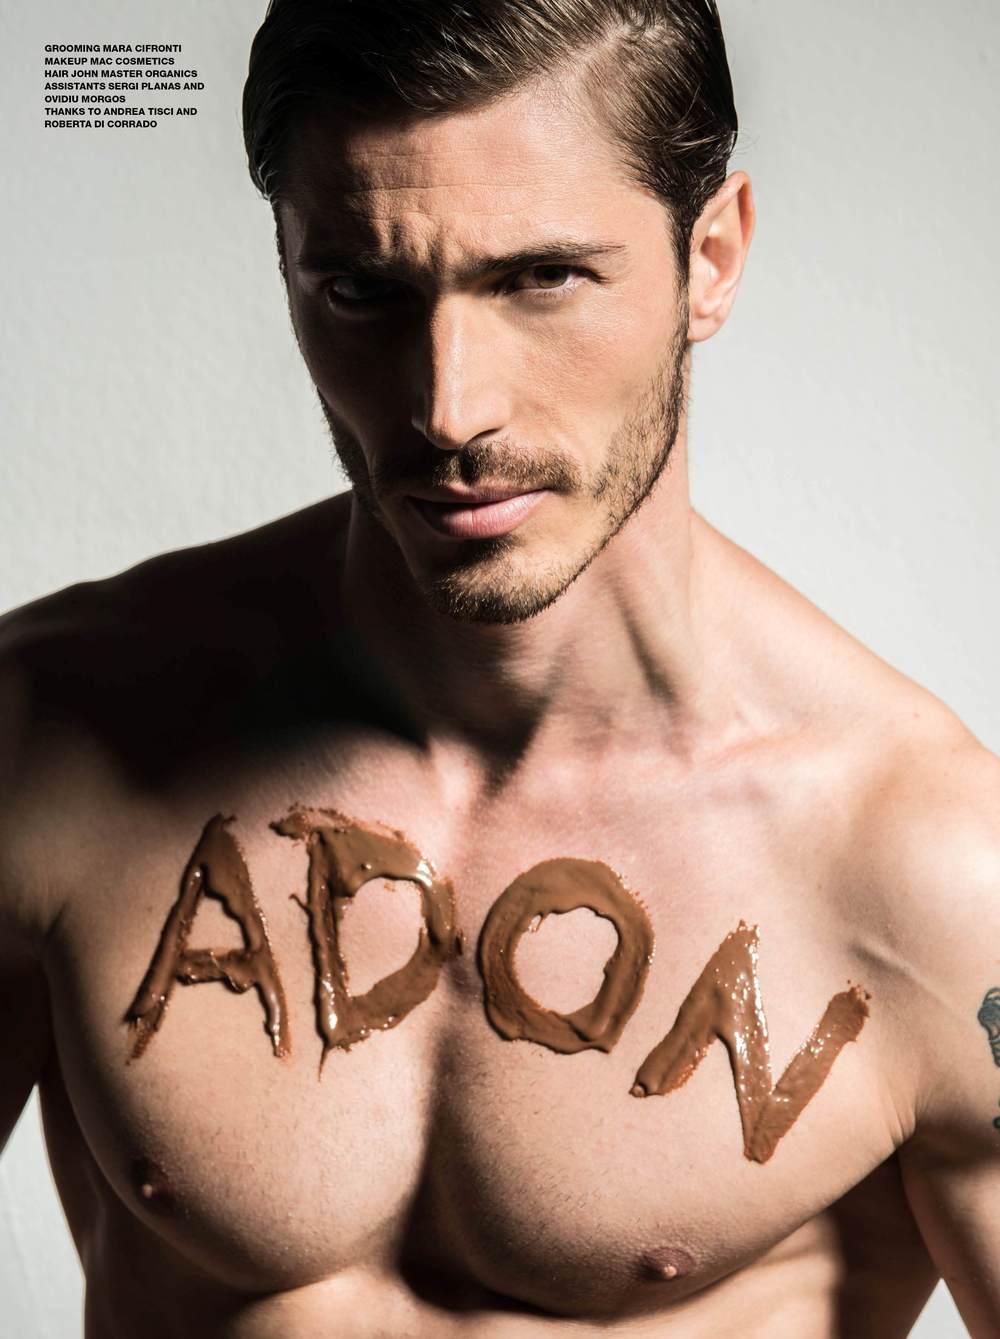 ADON 19_PRESS112.jpg